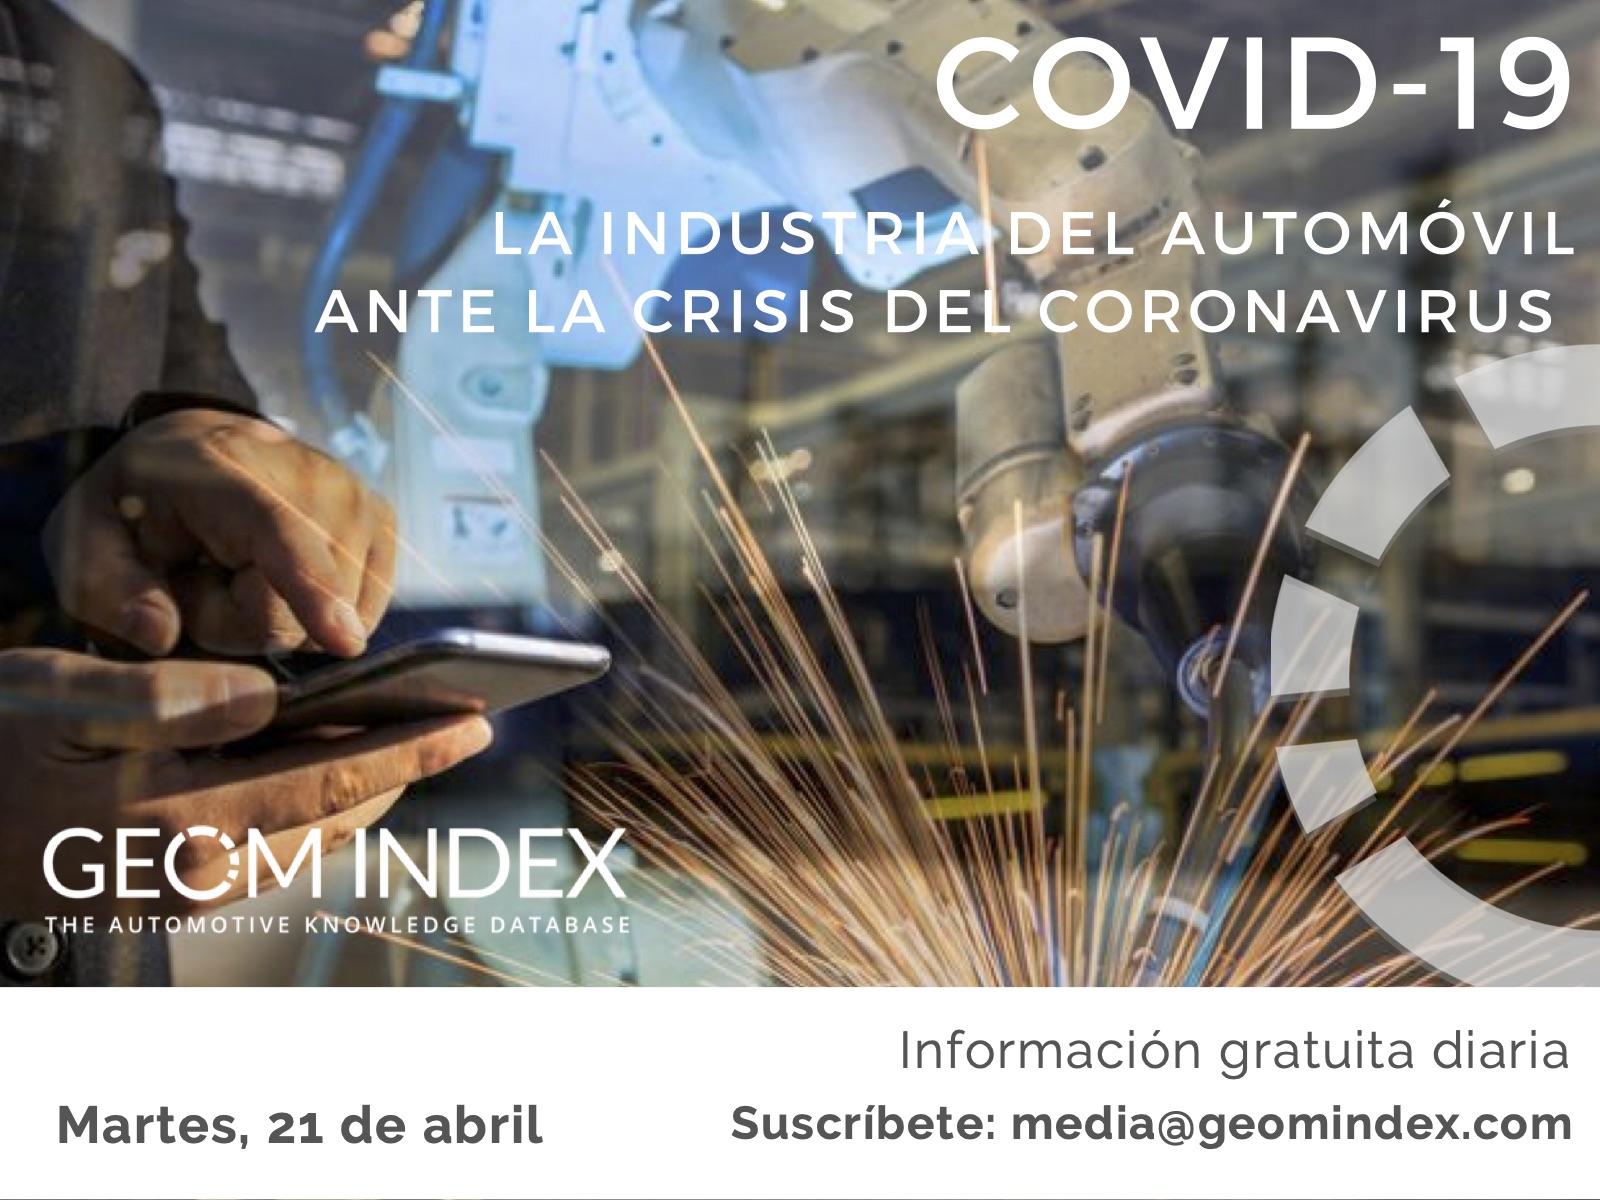 Informe 21 de abril – La industria del automóvil ante la crisis del Covid-19